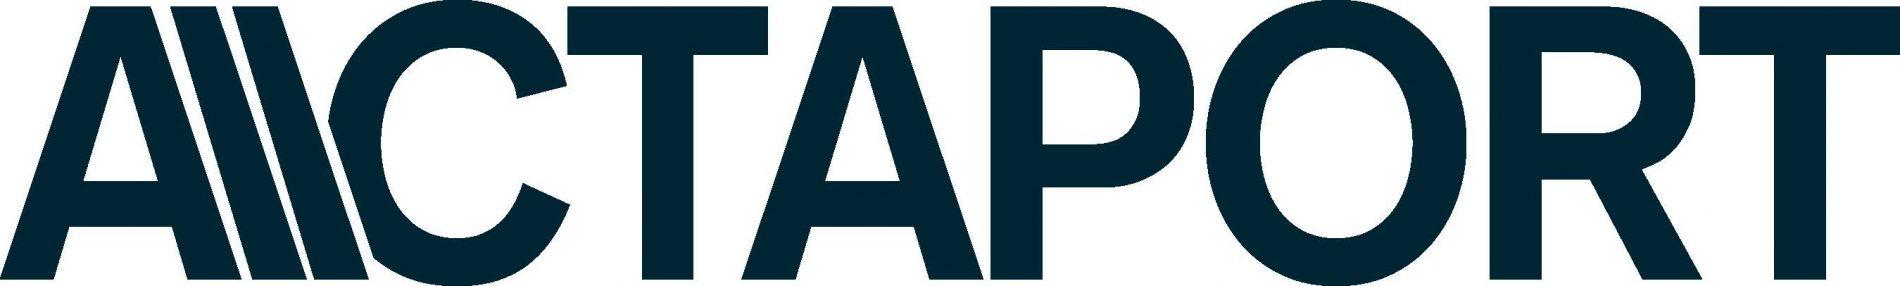 Actaport